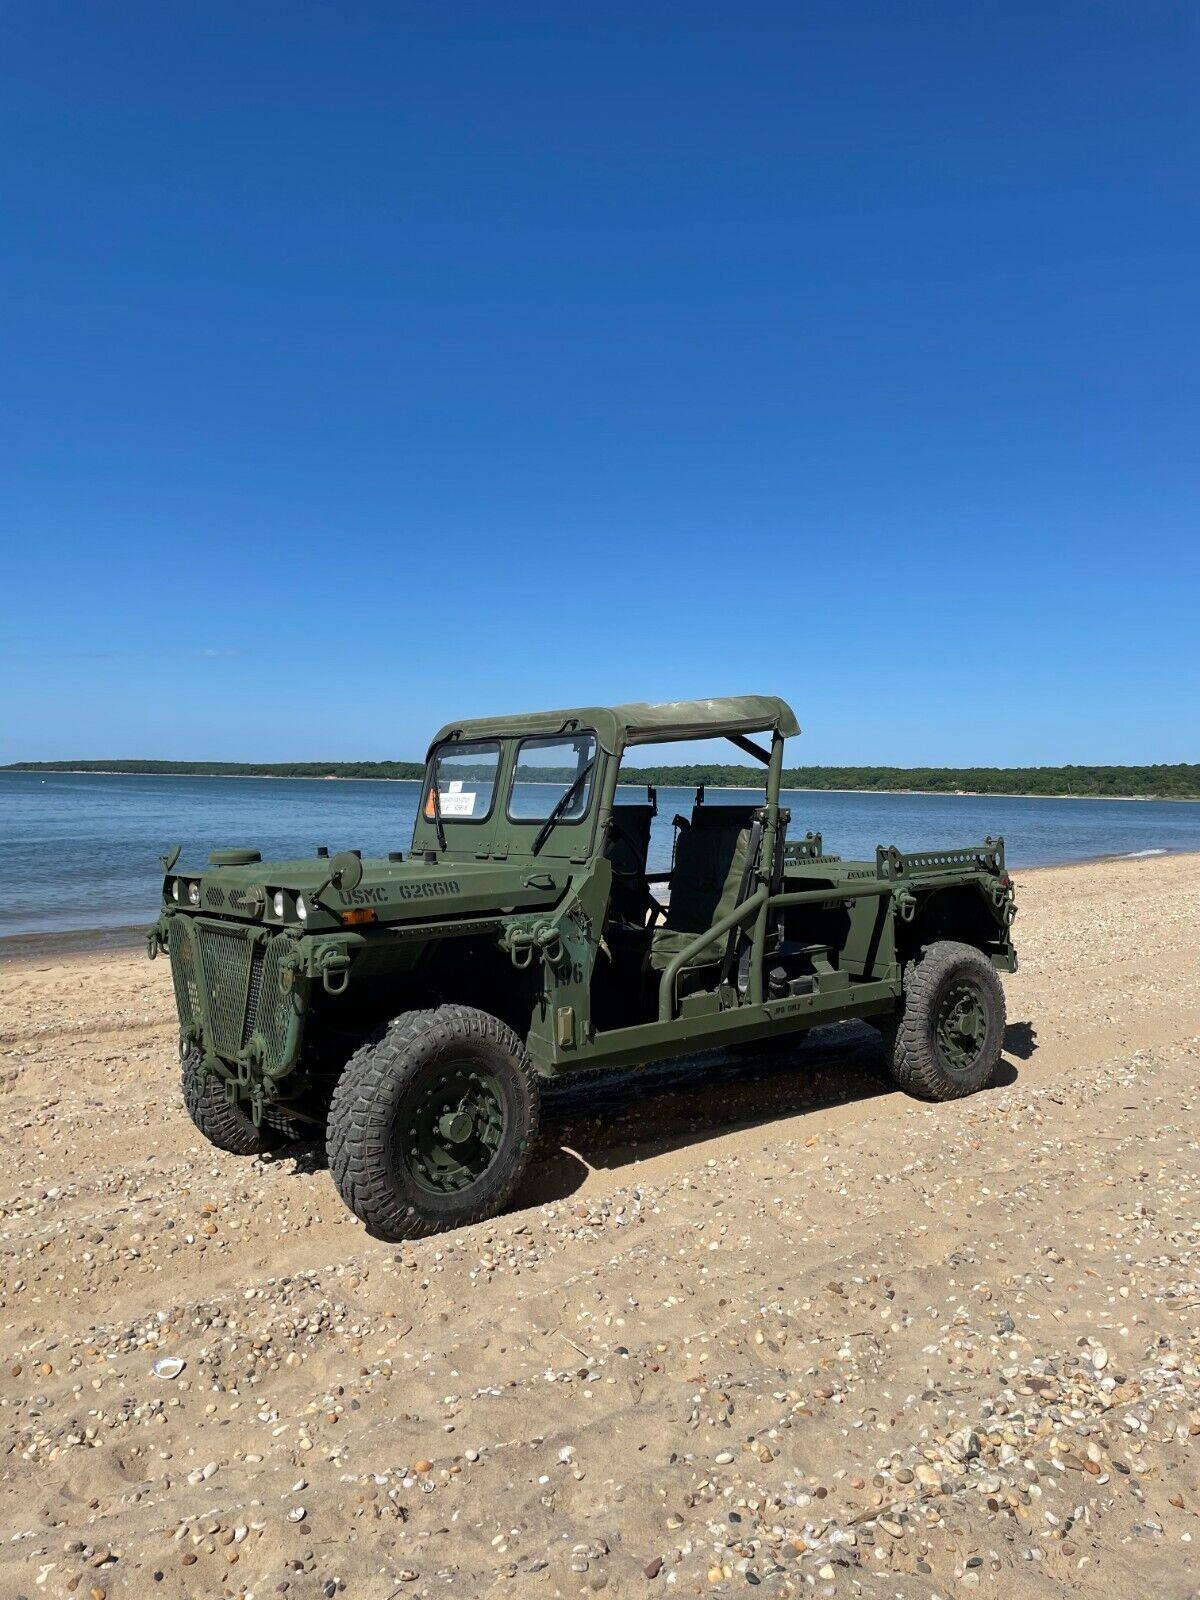 2011 General Dynamics M1161 Growler Light Strike Vehicle LSV MRZR Jeep